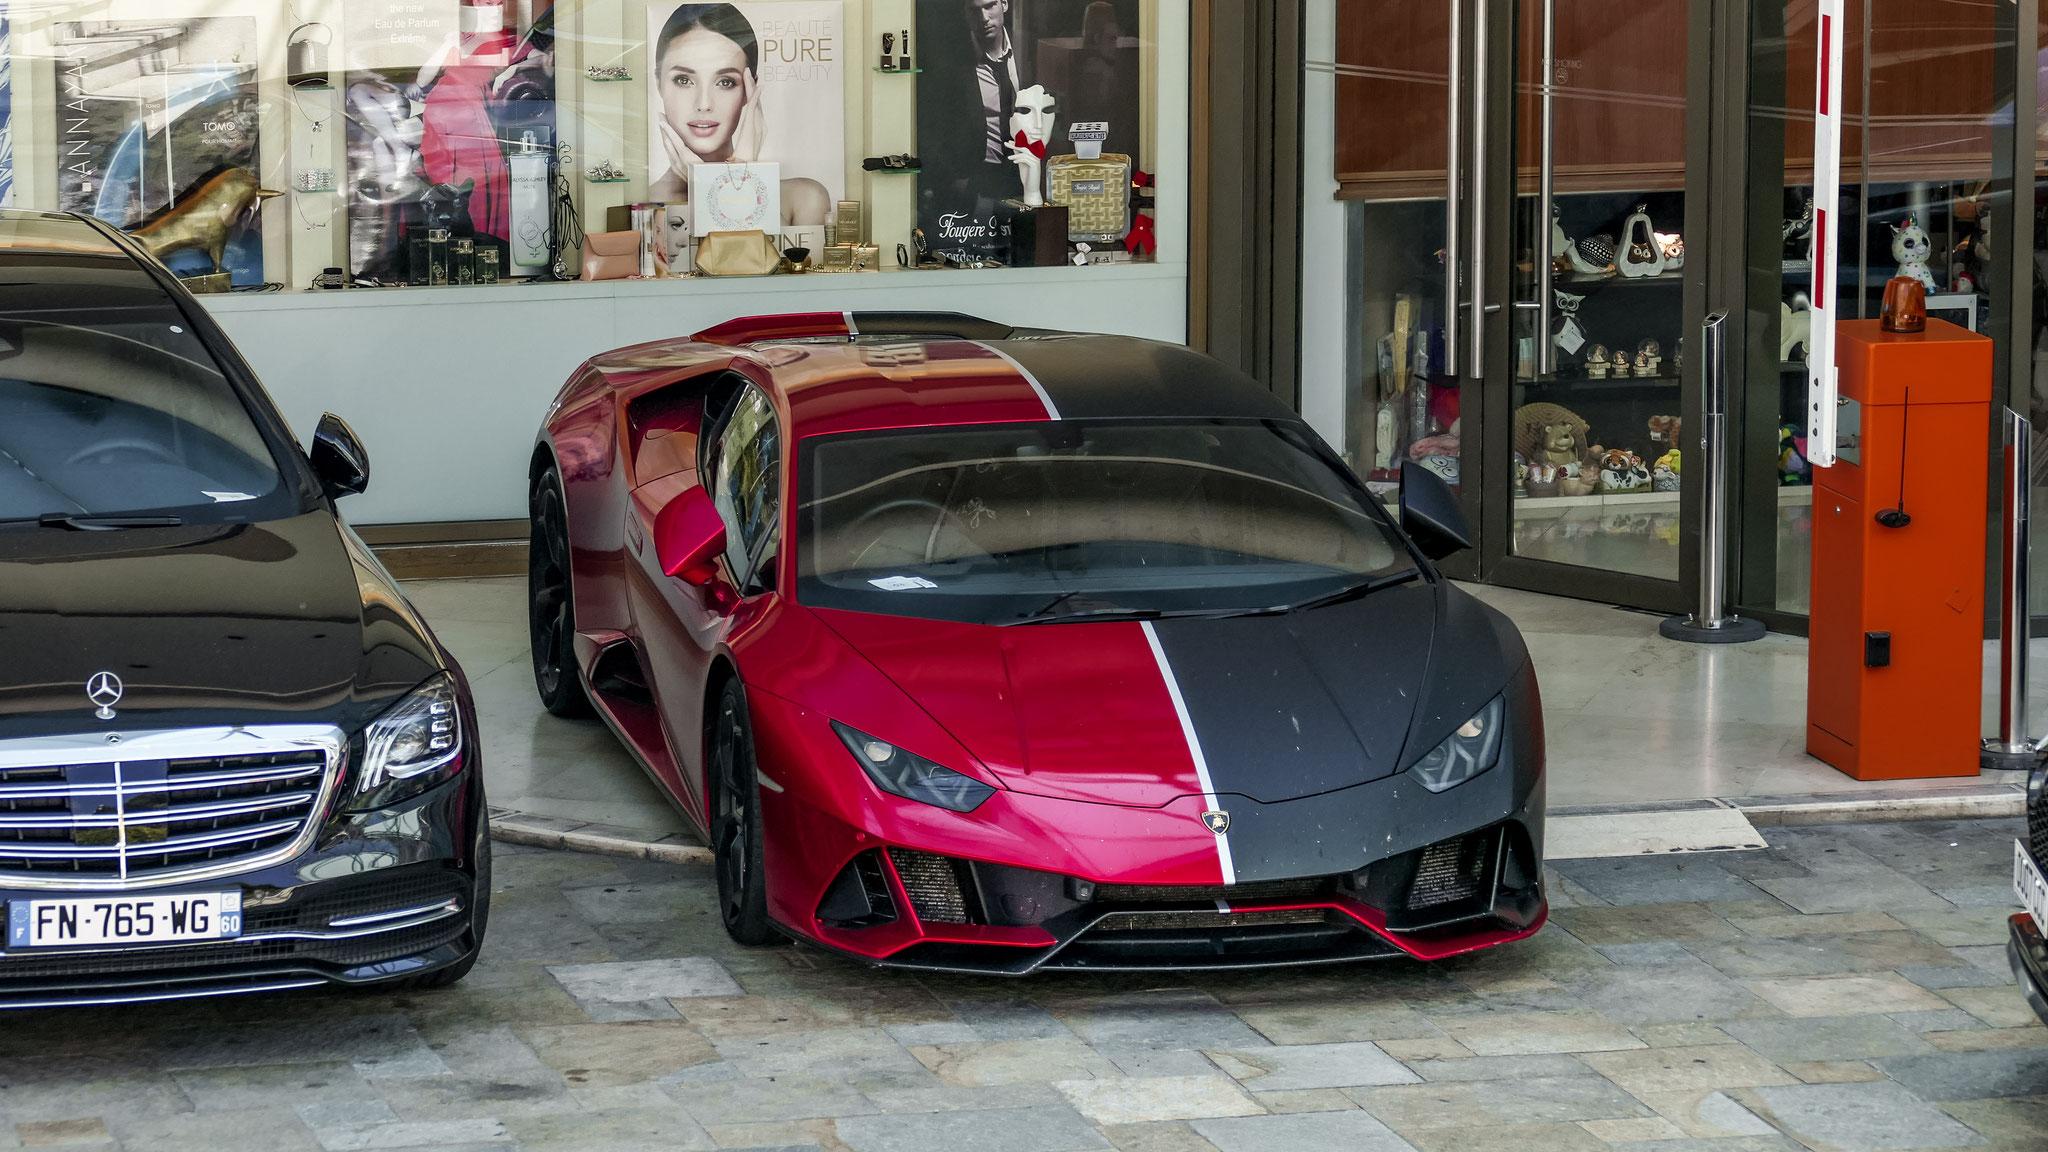 Lamborghini Huracan - J4444ONK (GB)